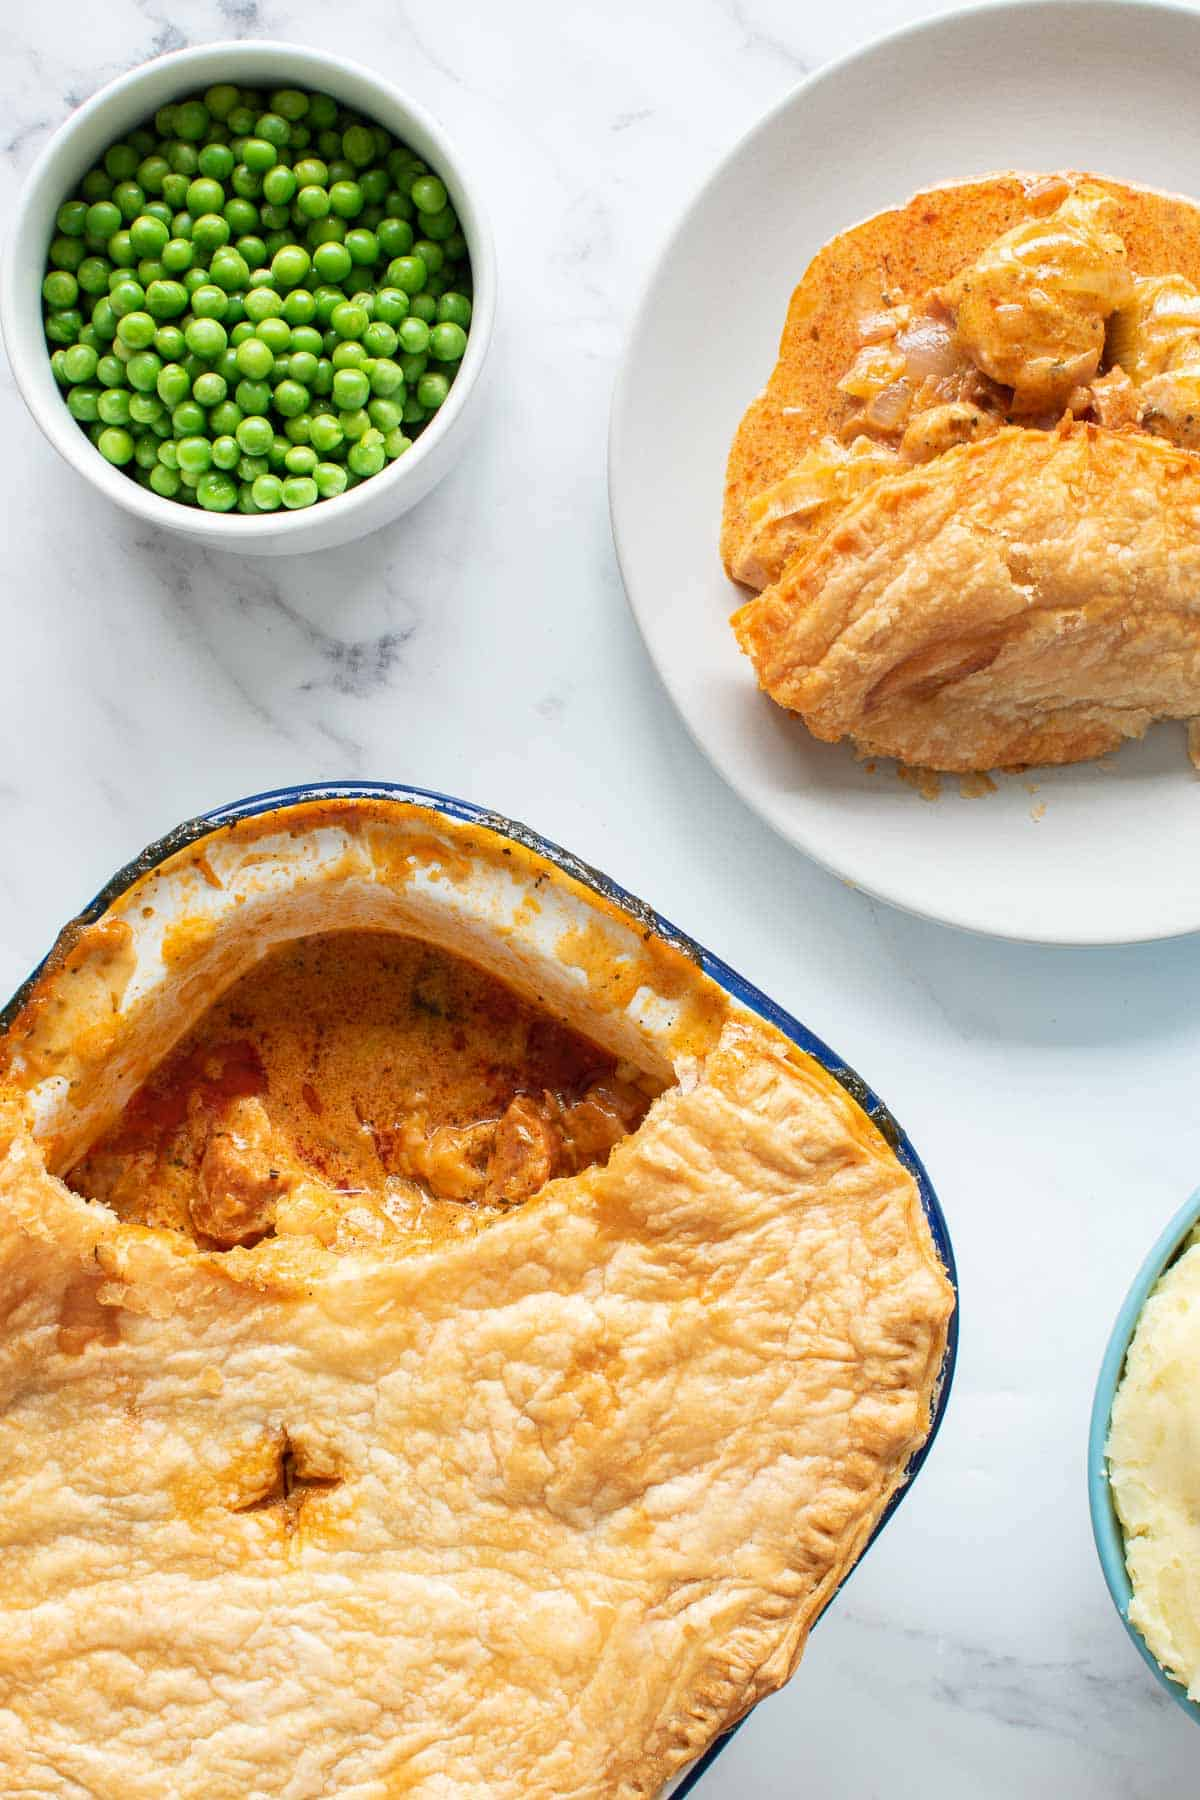 Creamy chicken pie with peas.